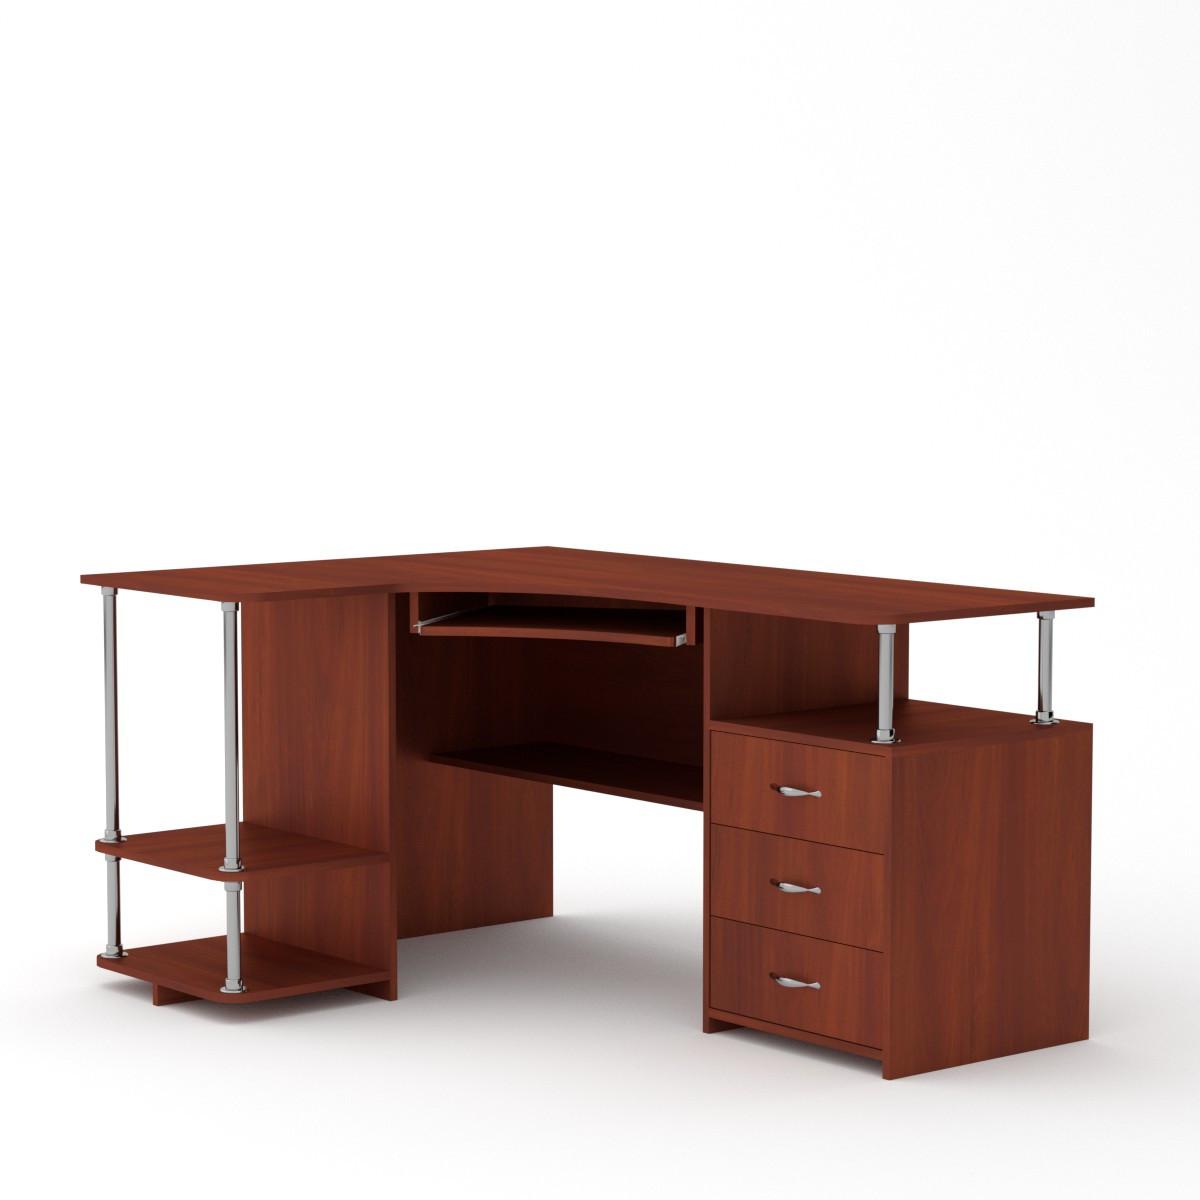 Стол компьютерный СУ-4 (кромка АБС - 2мм) яблоня Компанит (150х110х77 см)